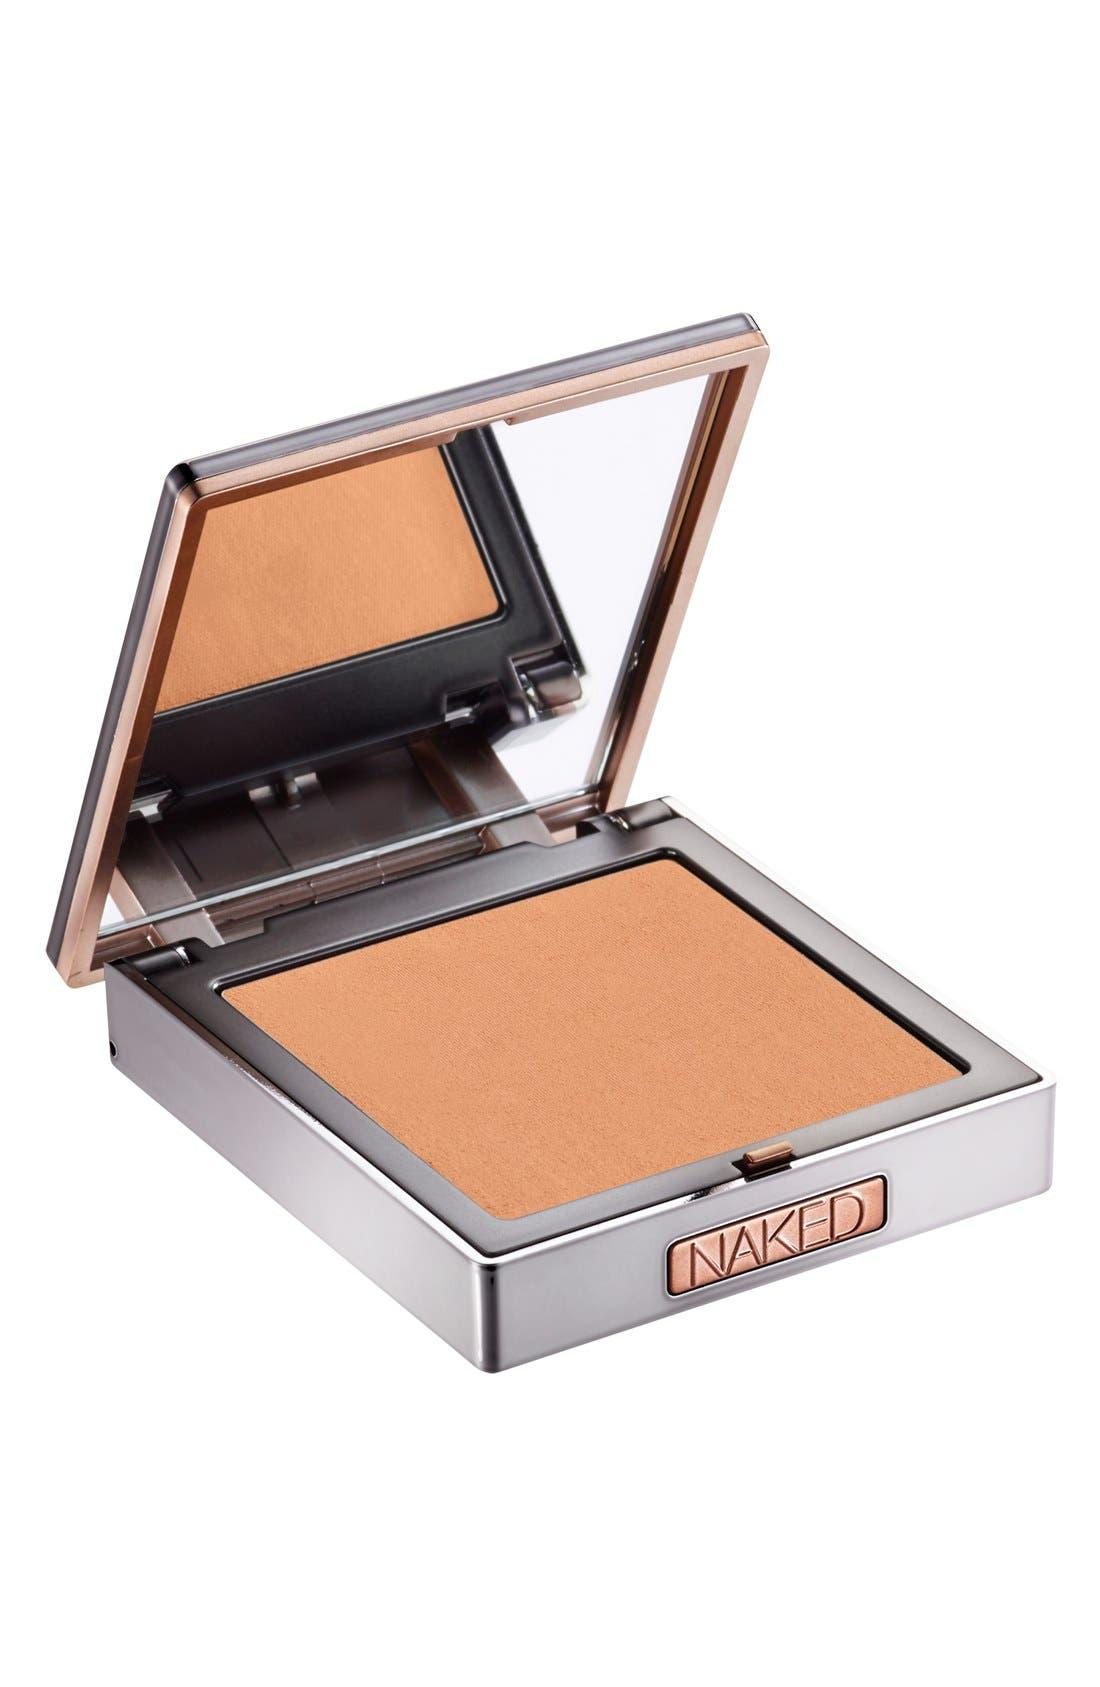 Naked Skin Ultra Definition Pressed Finishing Powder,                             Main thumbnail 1, color,                             NAKED MEDIUM DARK